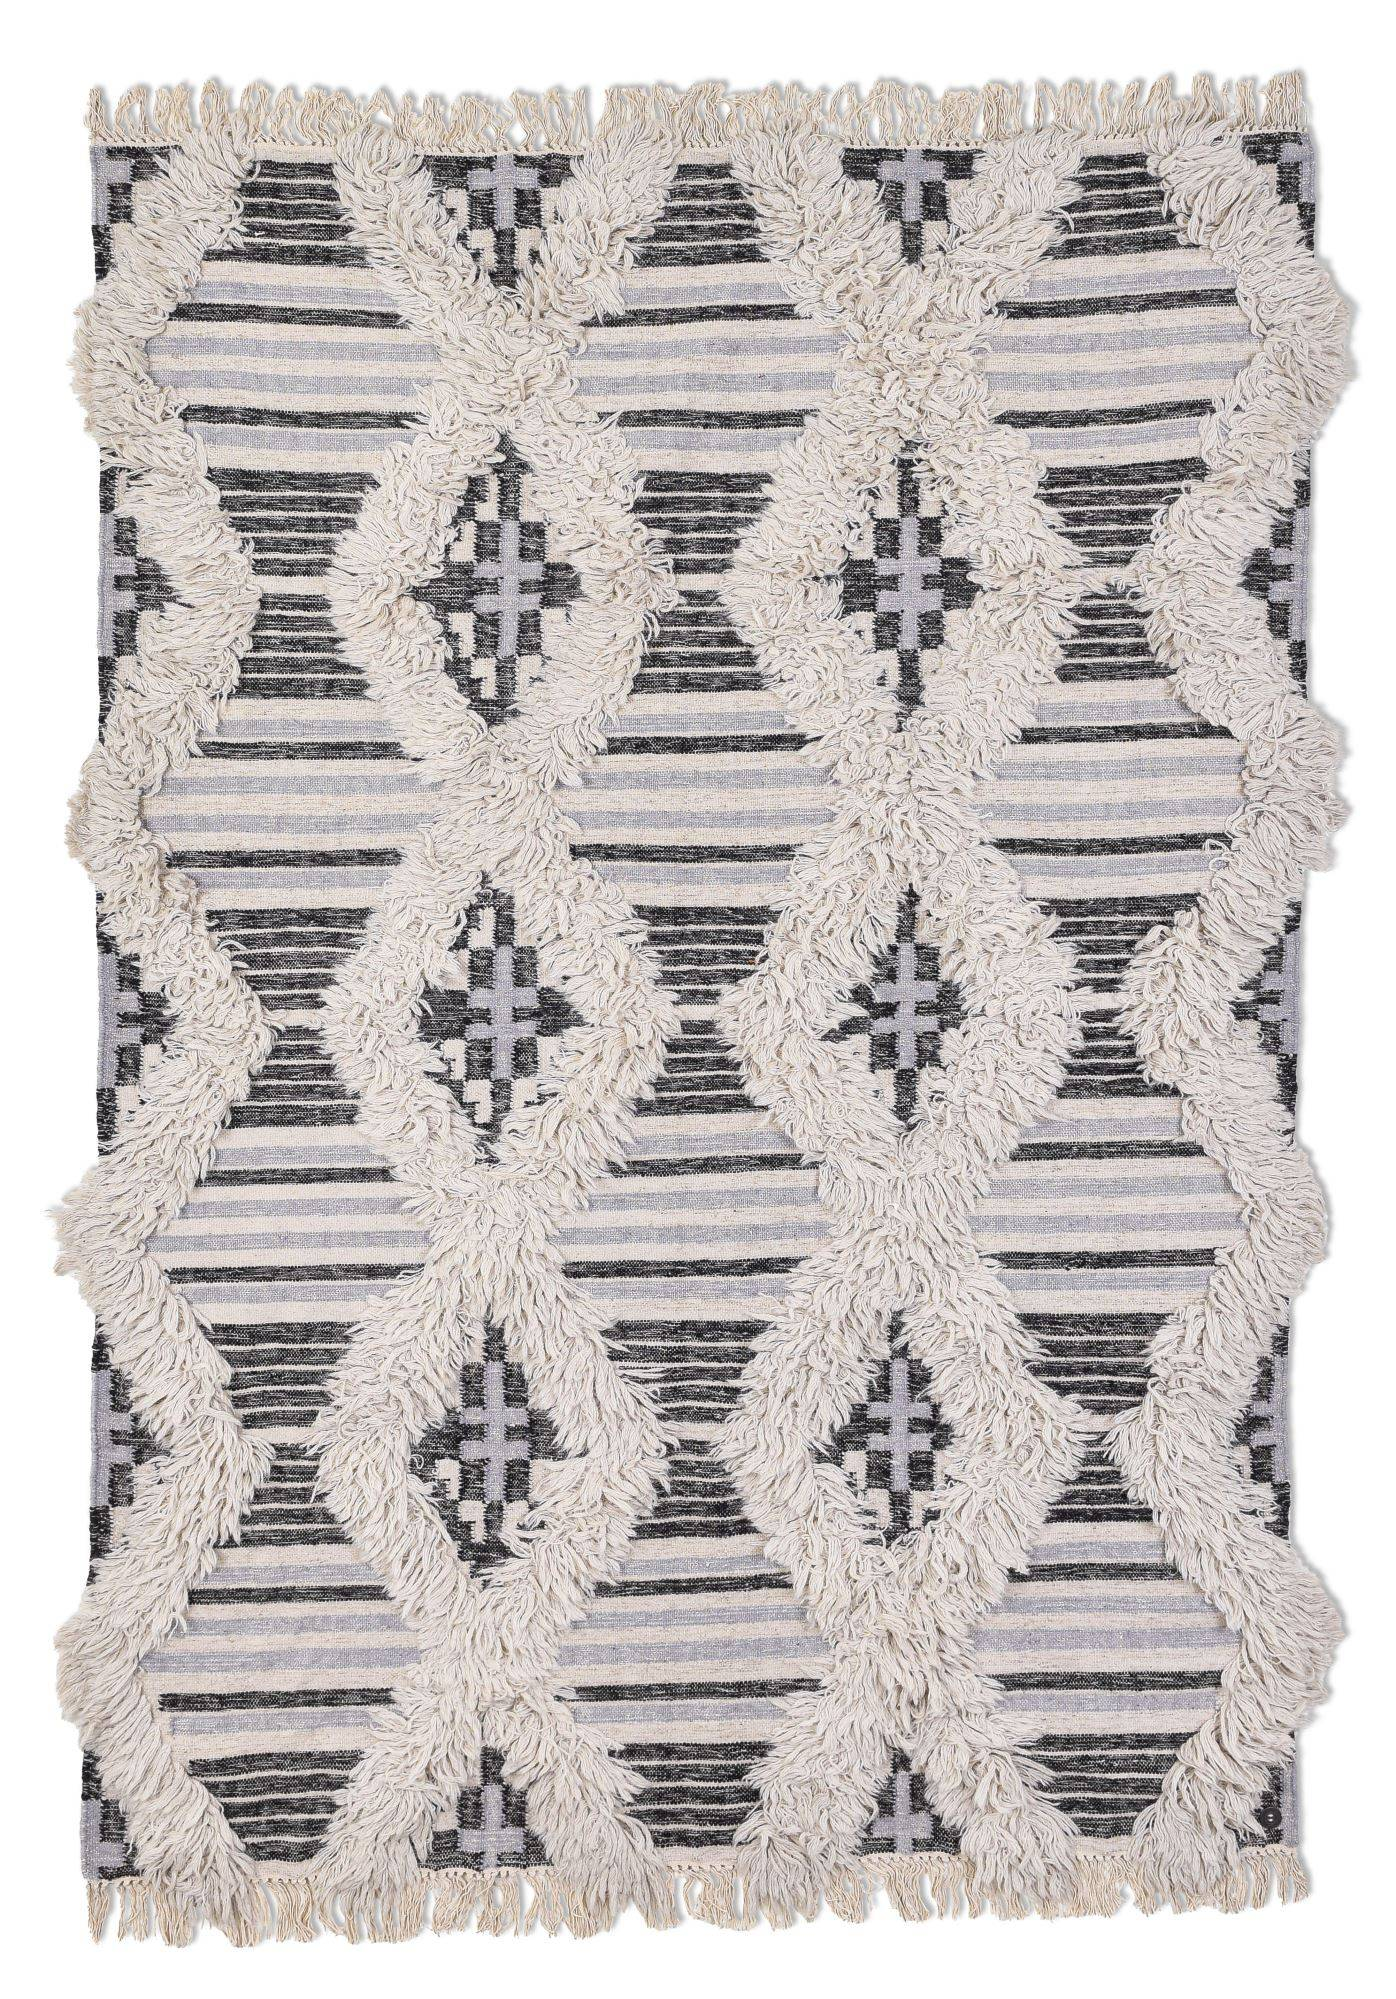 Tom Tailor Tapis kelim moderne en laine fait main noir et blanc 140x200